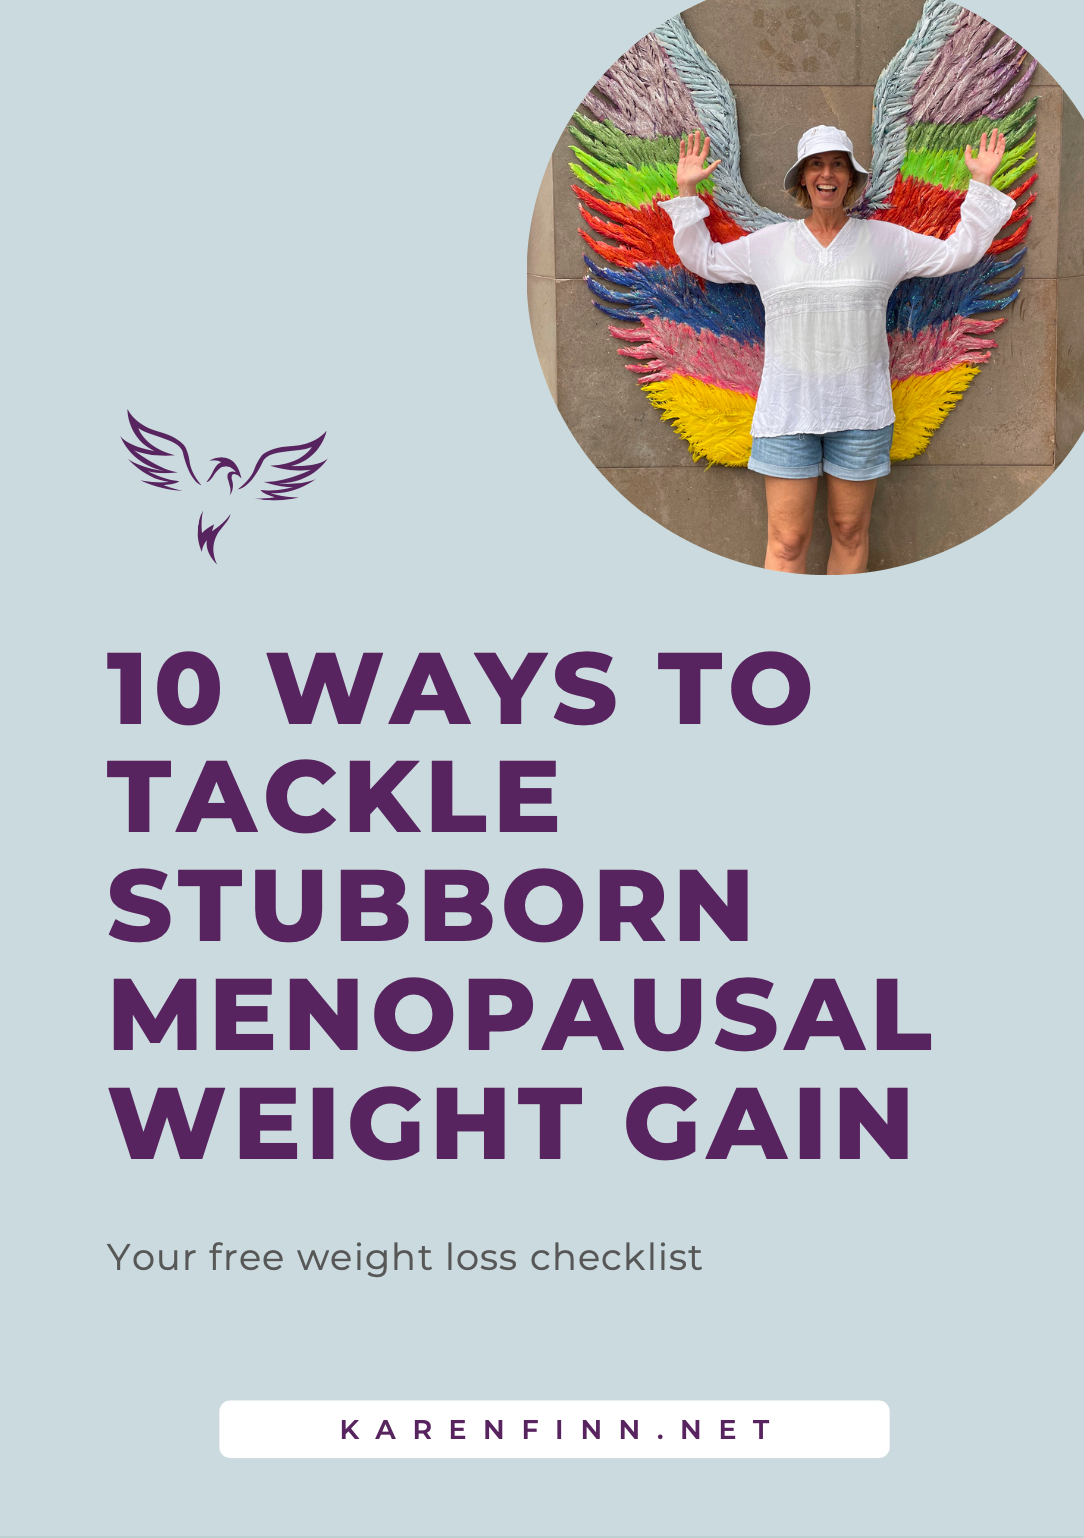 V3 10 ways to tackle stubborn menopausal weight gain 1 pdf Freebie